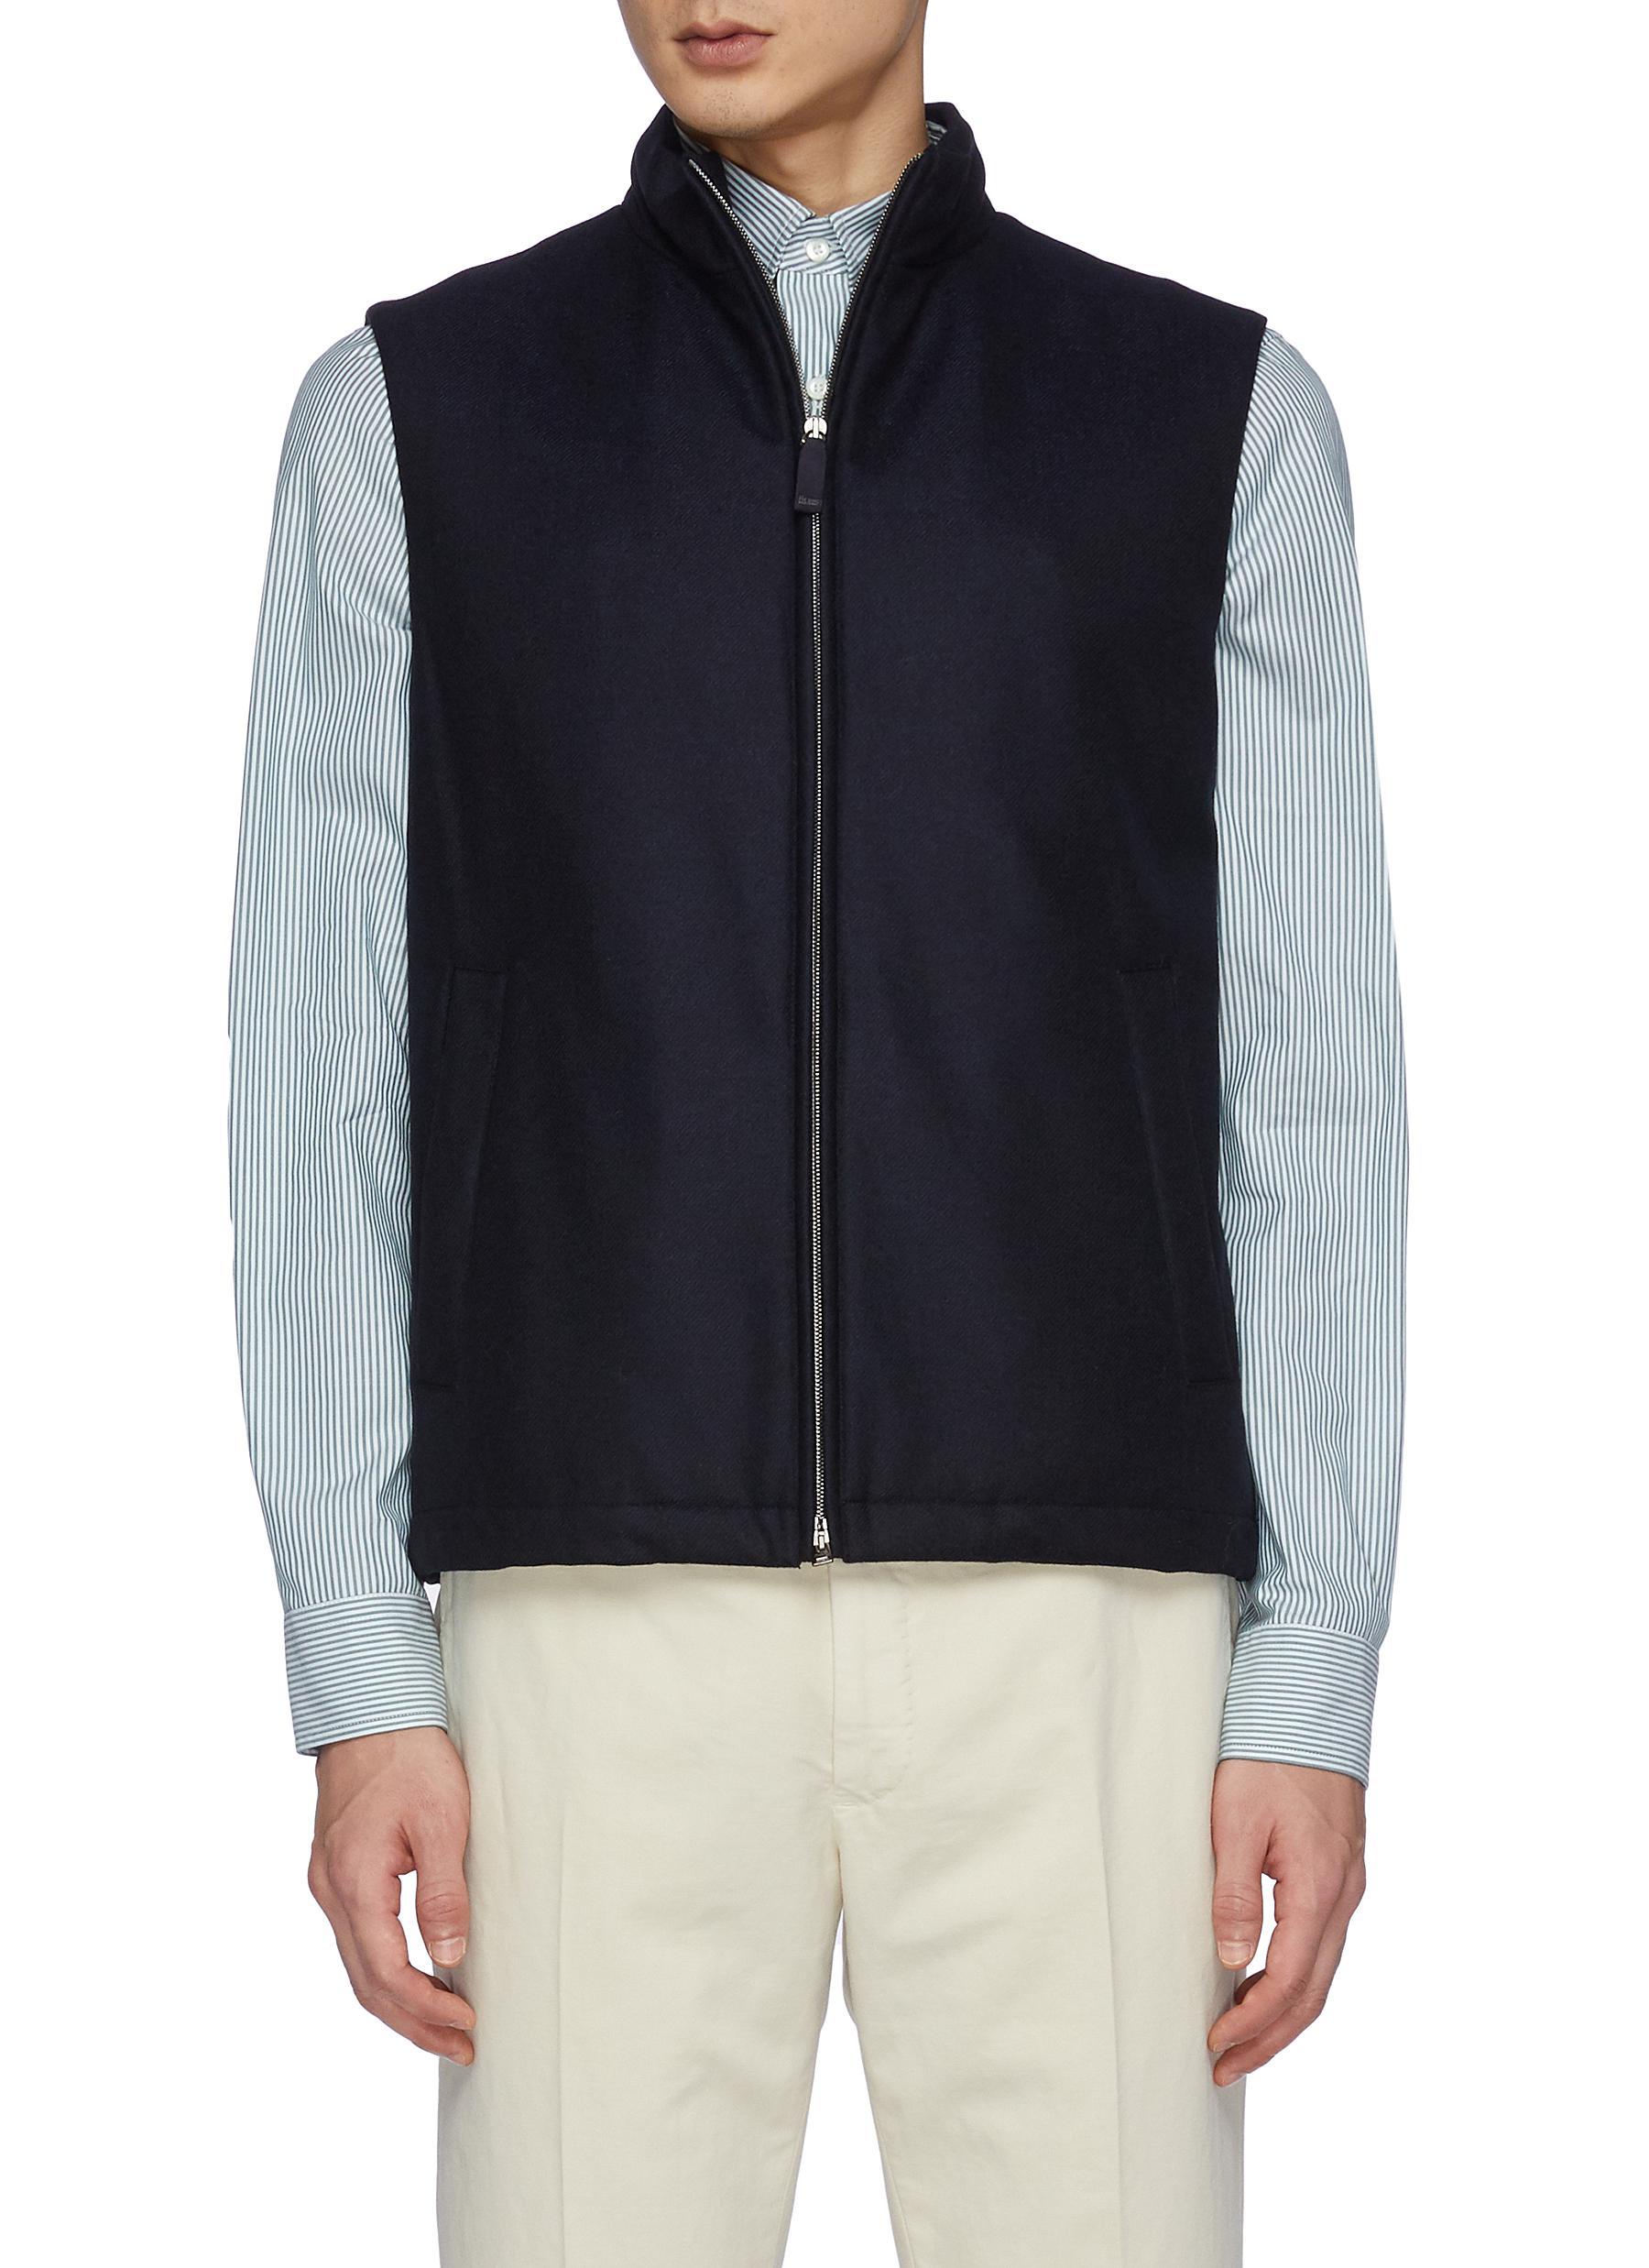 Zipped Stand Collar Cashmere Virgin Wool Blend Vest - HERNO - Modalova